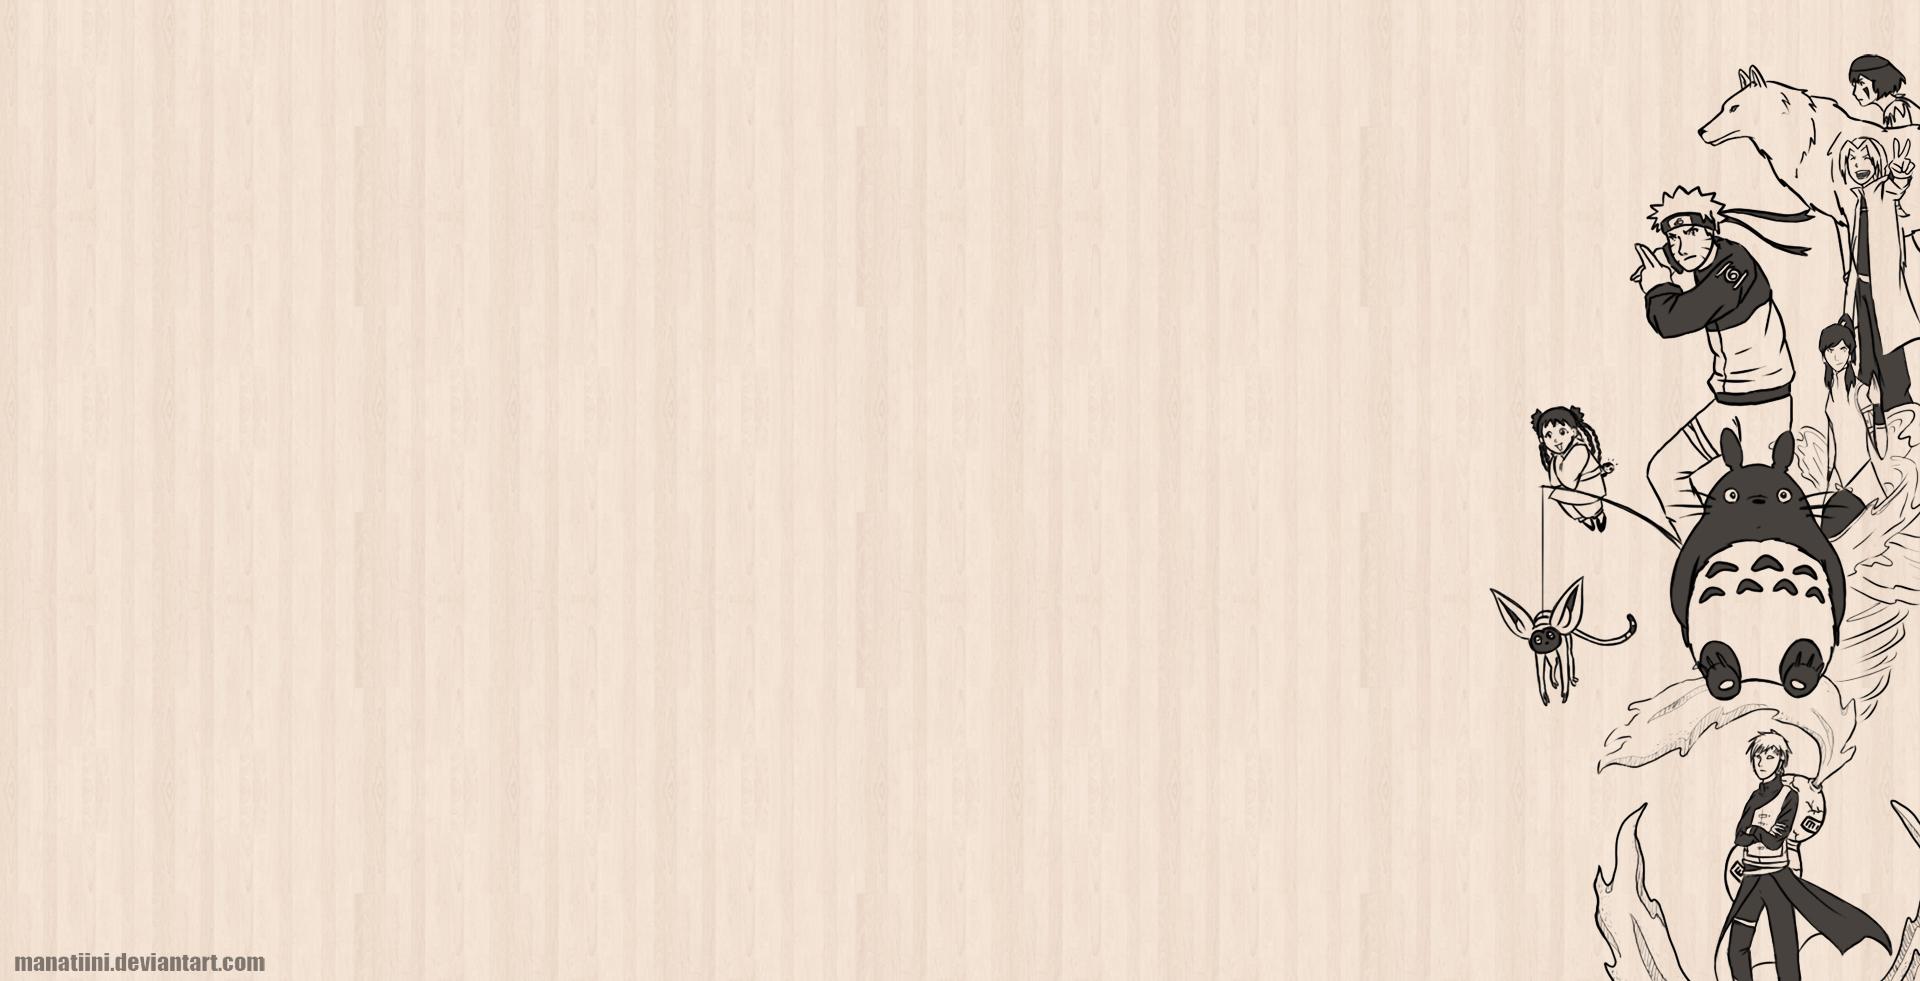 20+] Tumblr Anime Wallpaper on WallpaperSafari